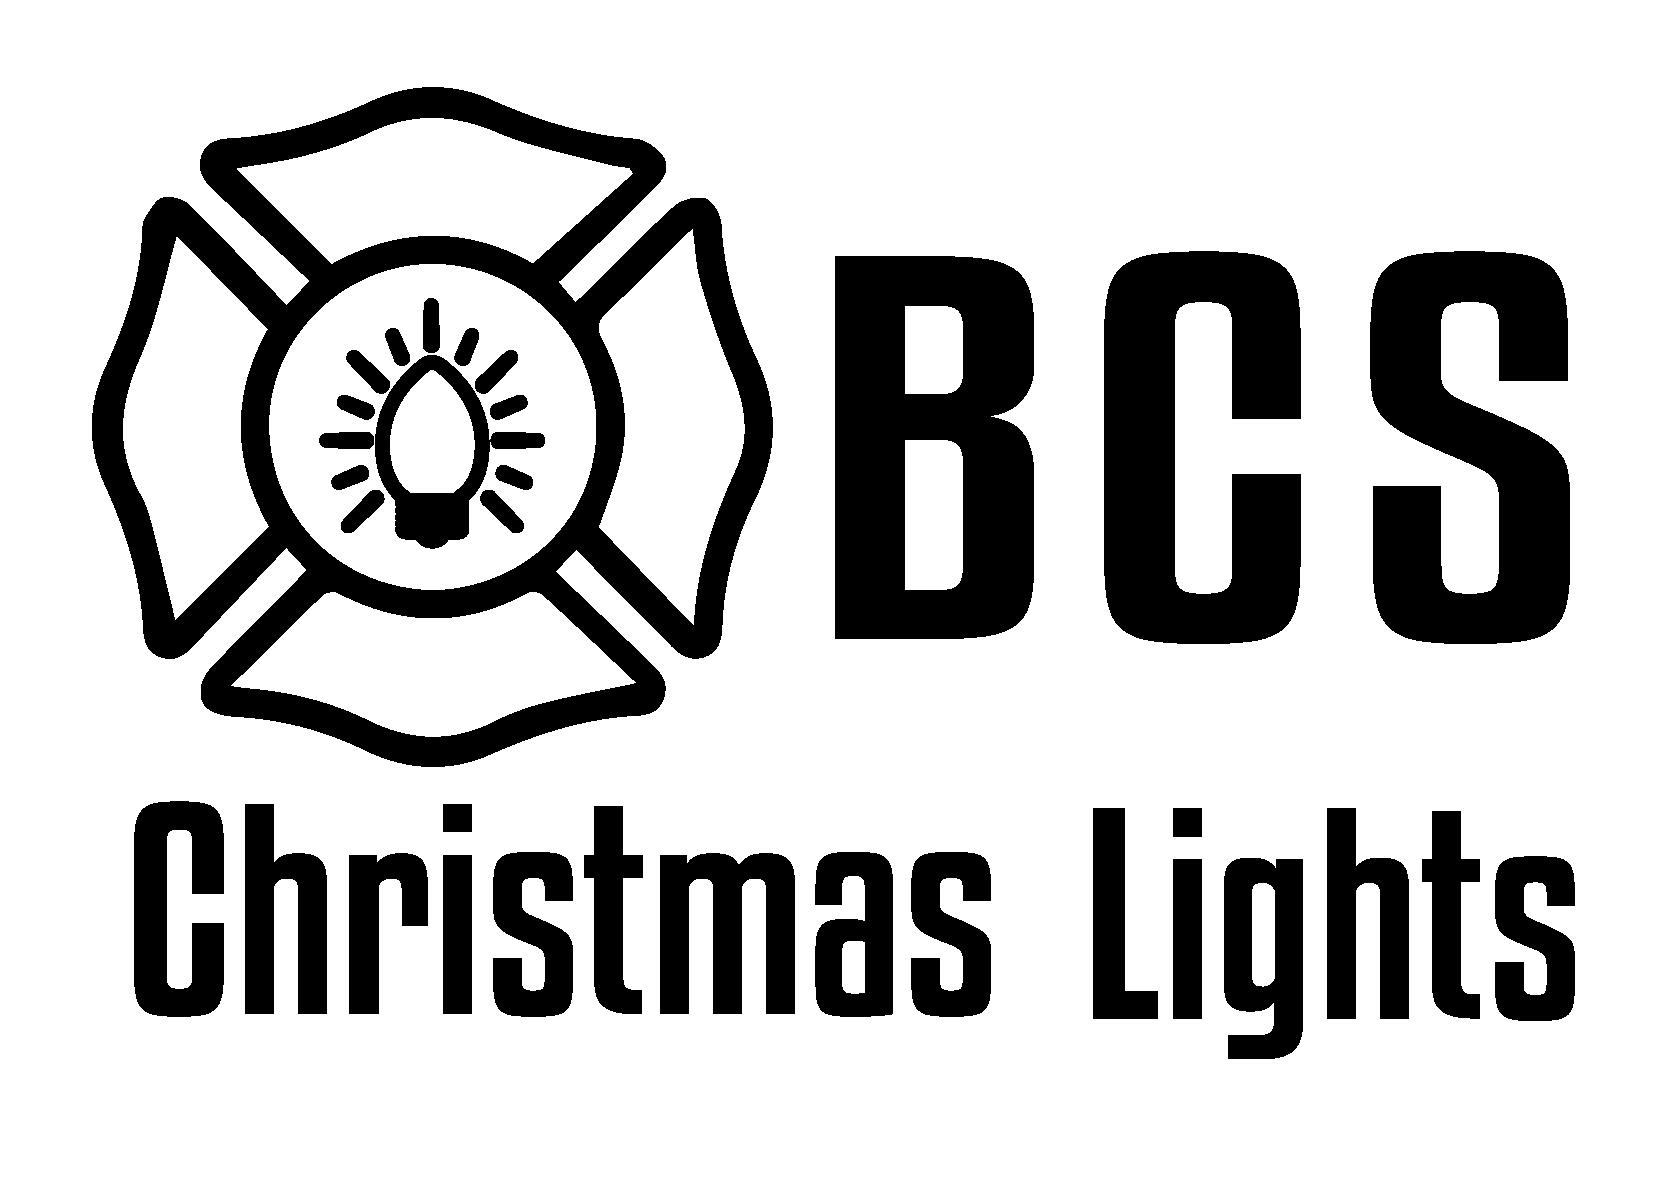 bcs christmas lights logo.png